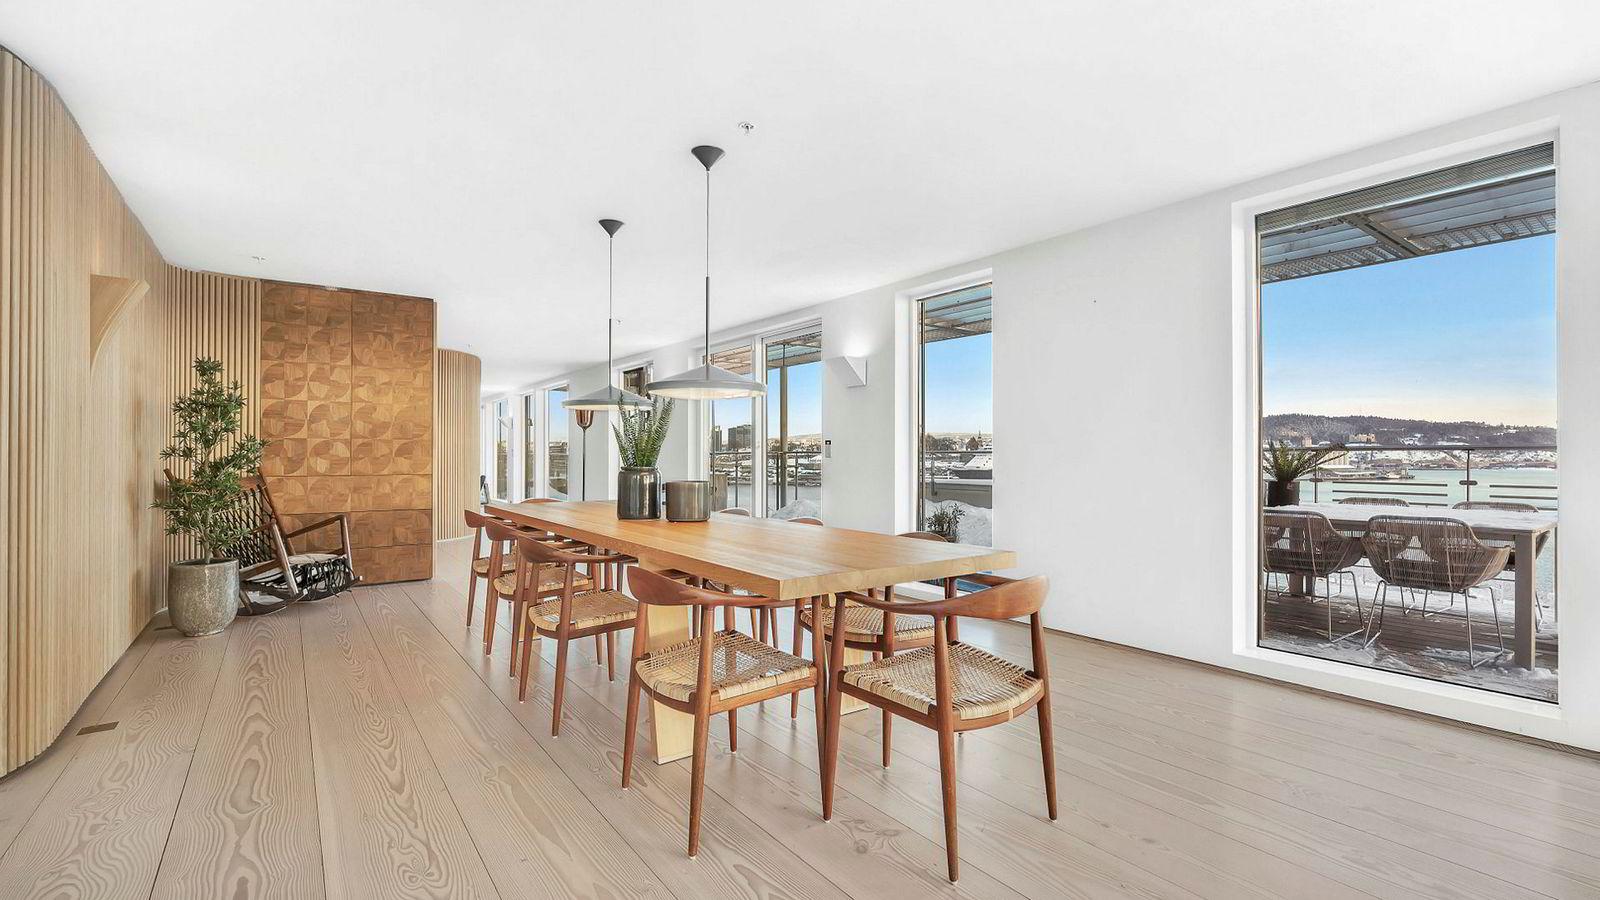 Krafttrader Einar Aas selger nå leiligheten på Strandpromenaden 5 på Tjuvholmen for 67,5 millioner kroner.